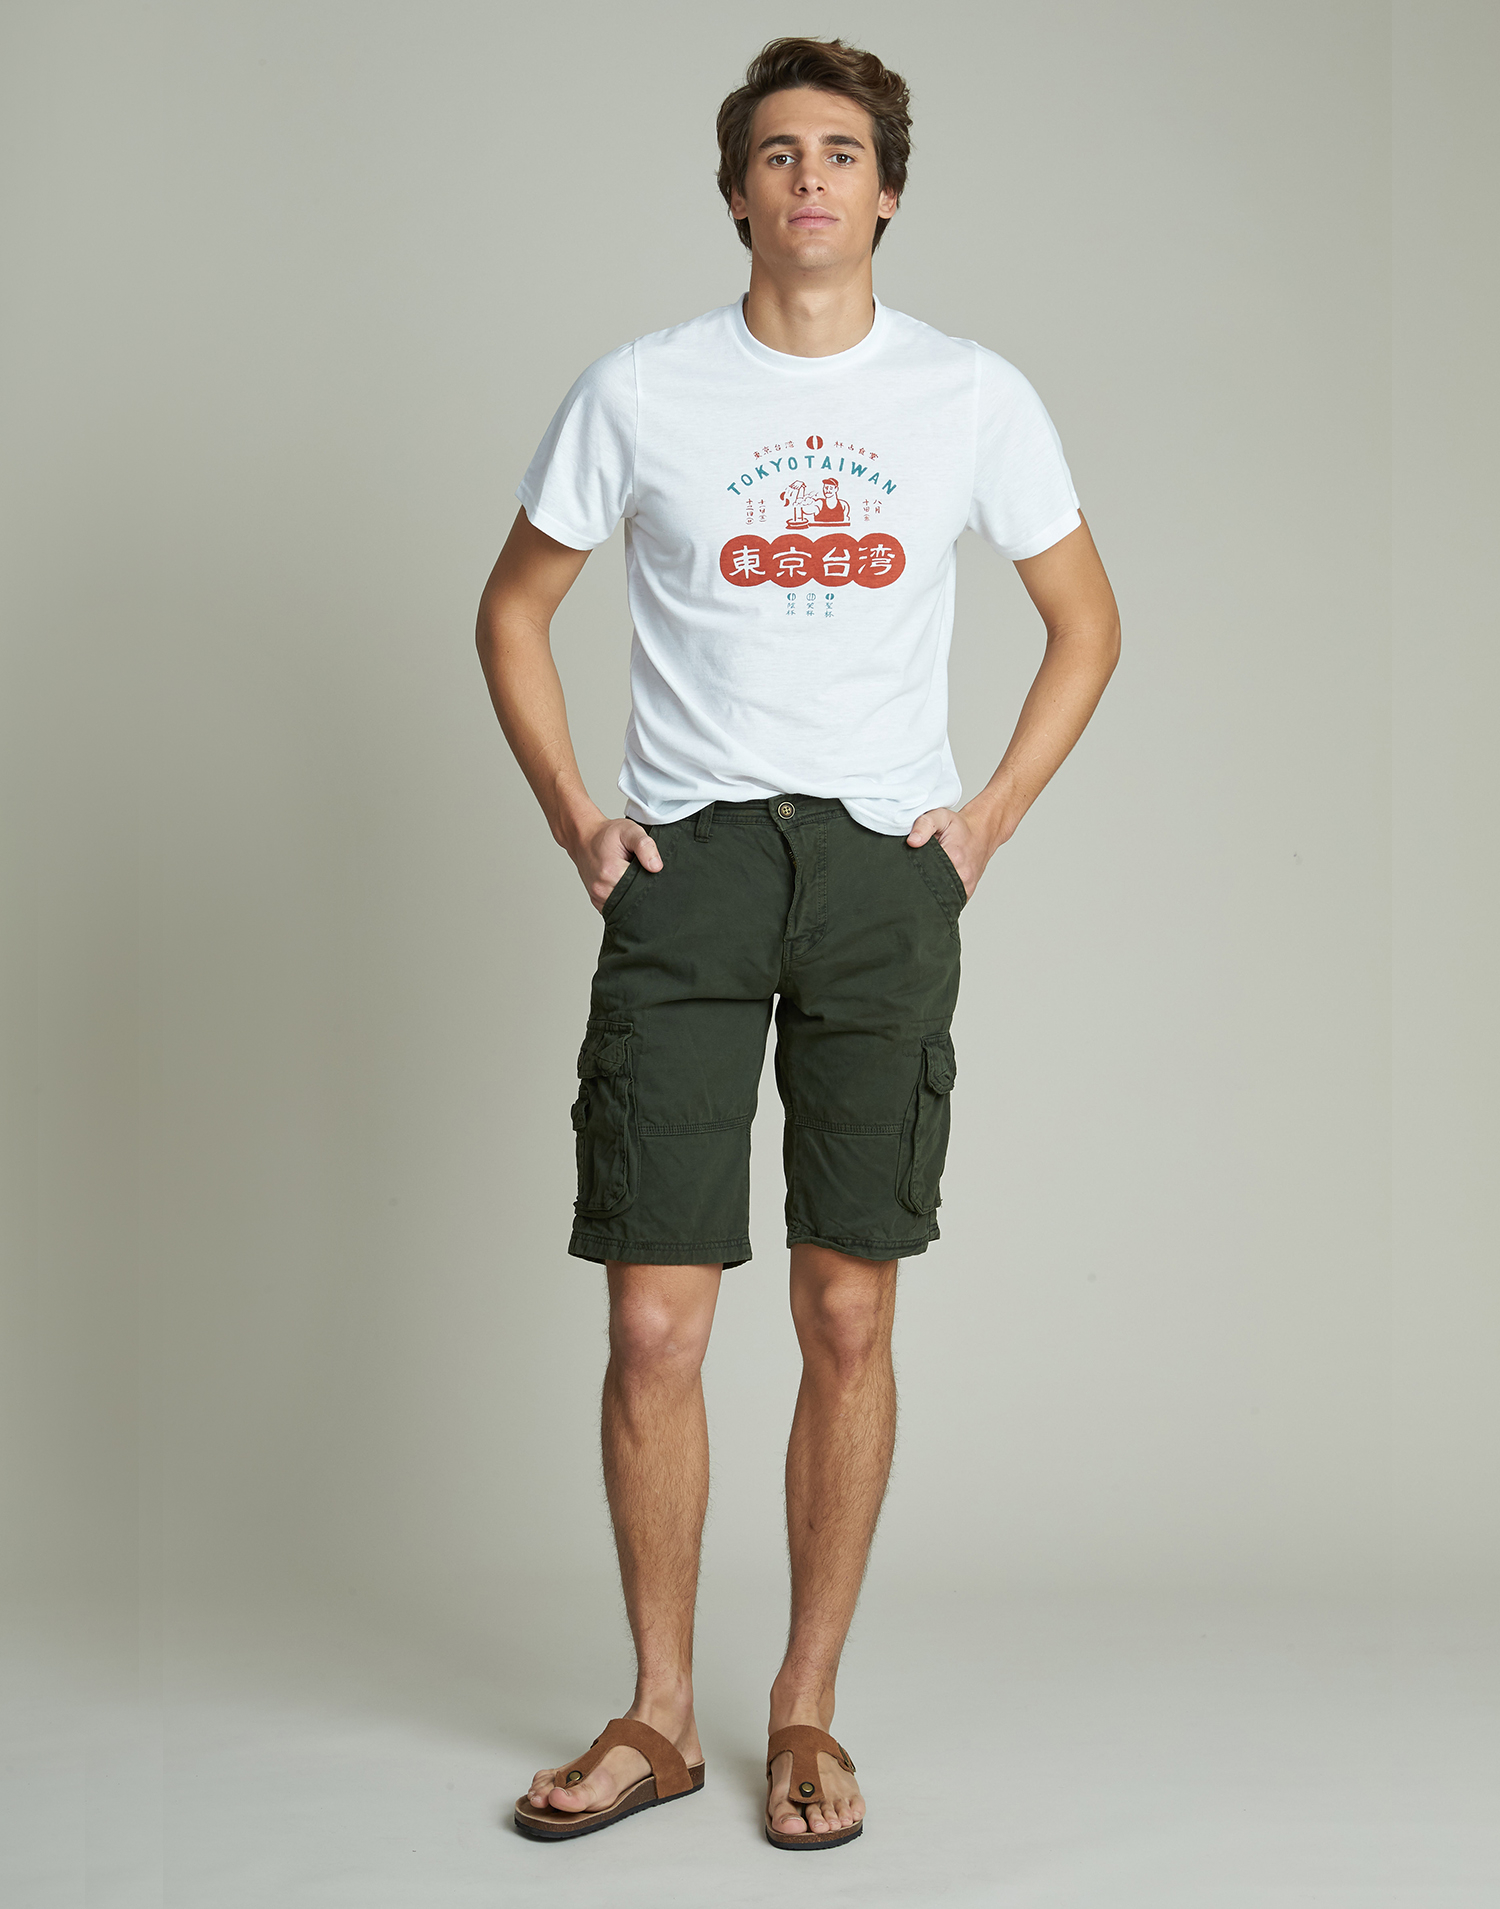 Bermuda homme avec poches